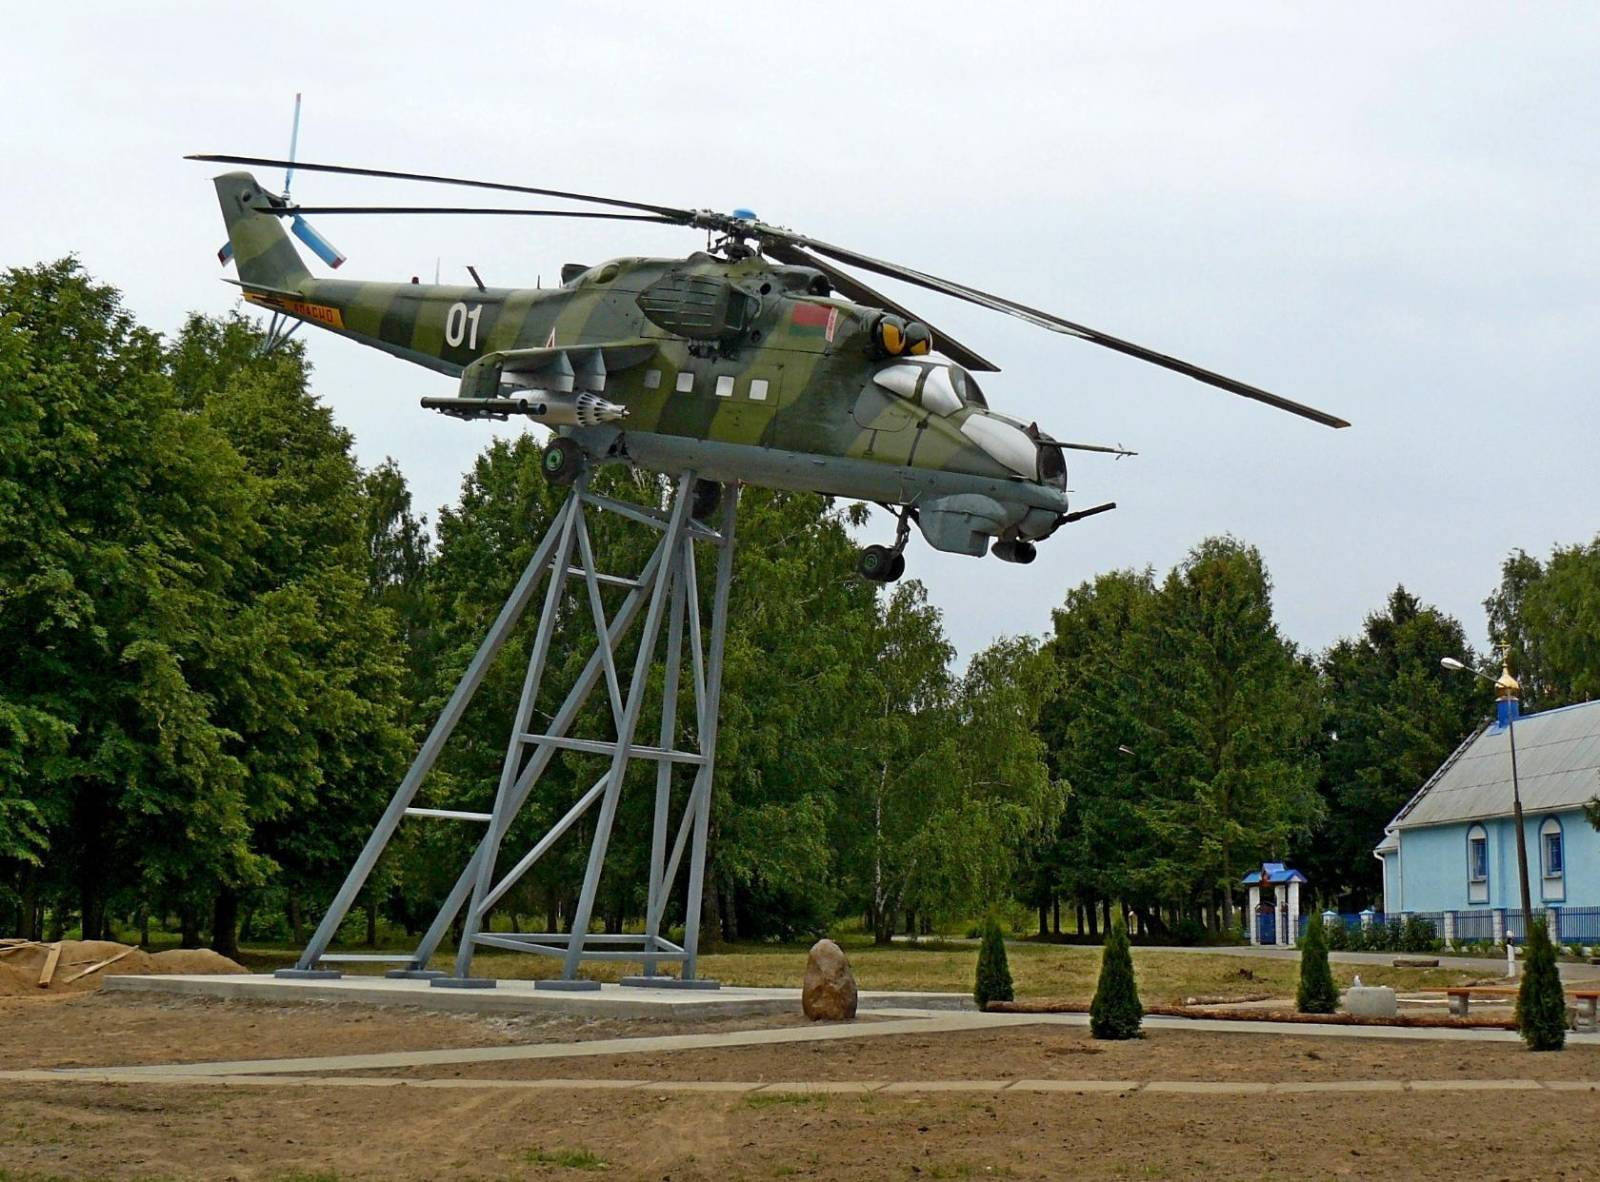 http://aircraft-museum.ucoz.ru/_ph/2/792754863.jpg?1436084296